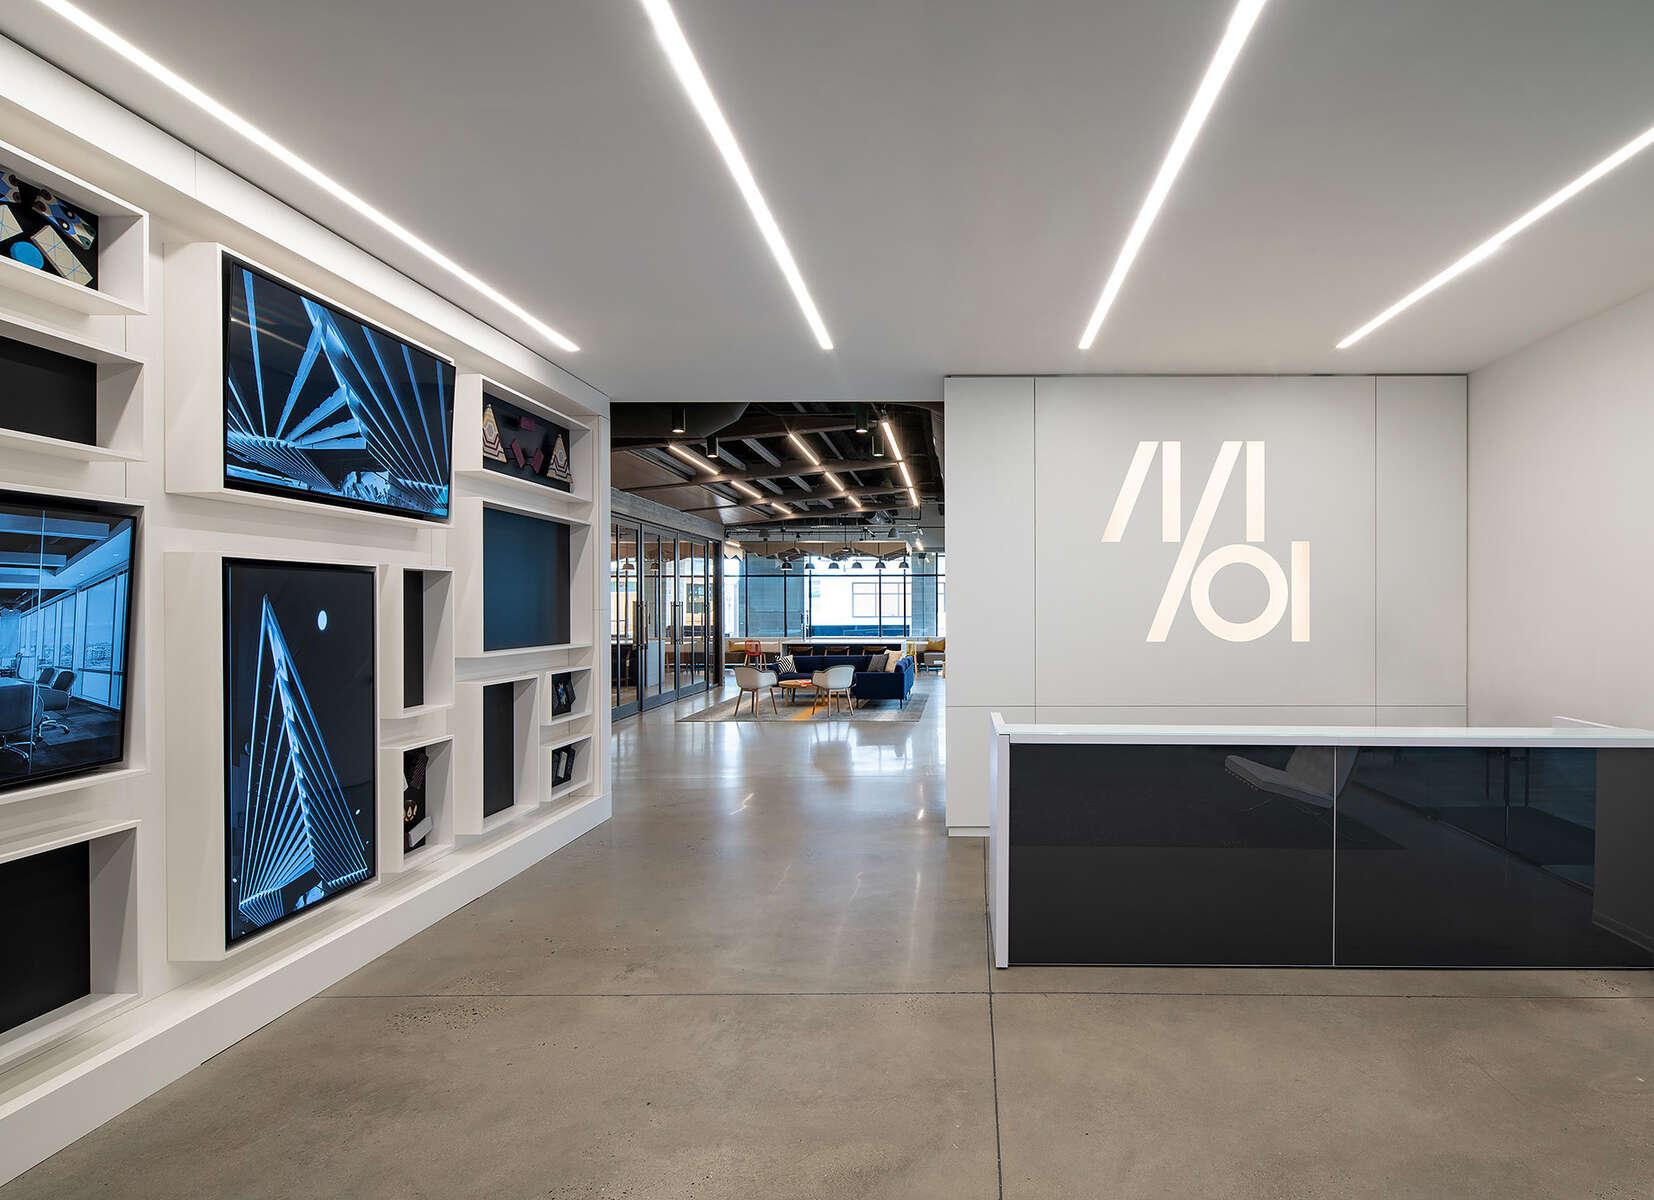 MOIBaltimore, MDFOX Architects